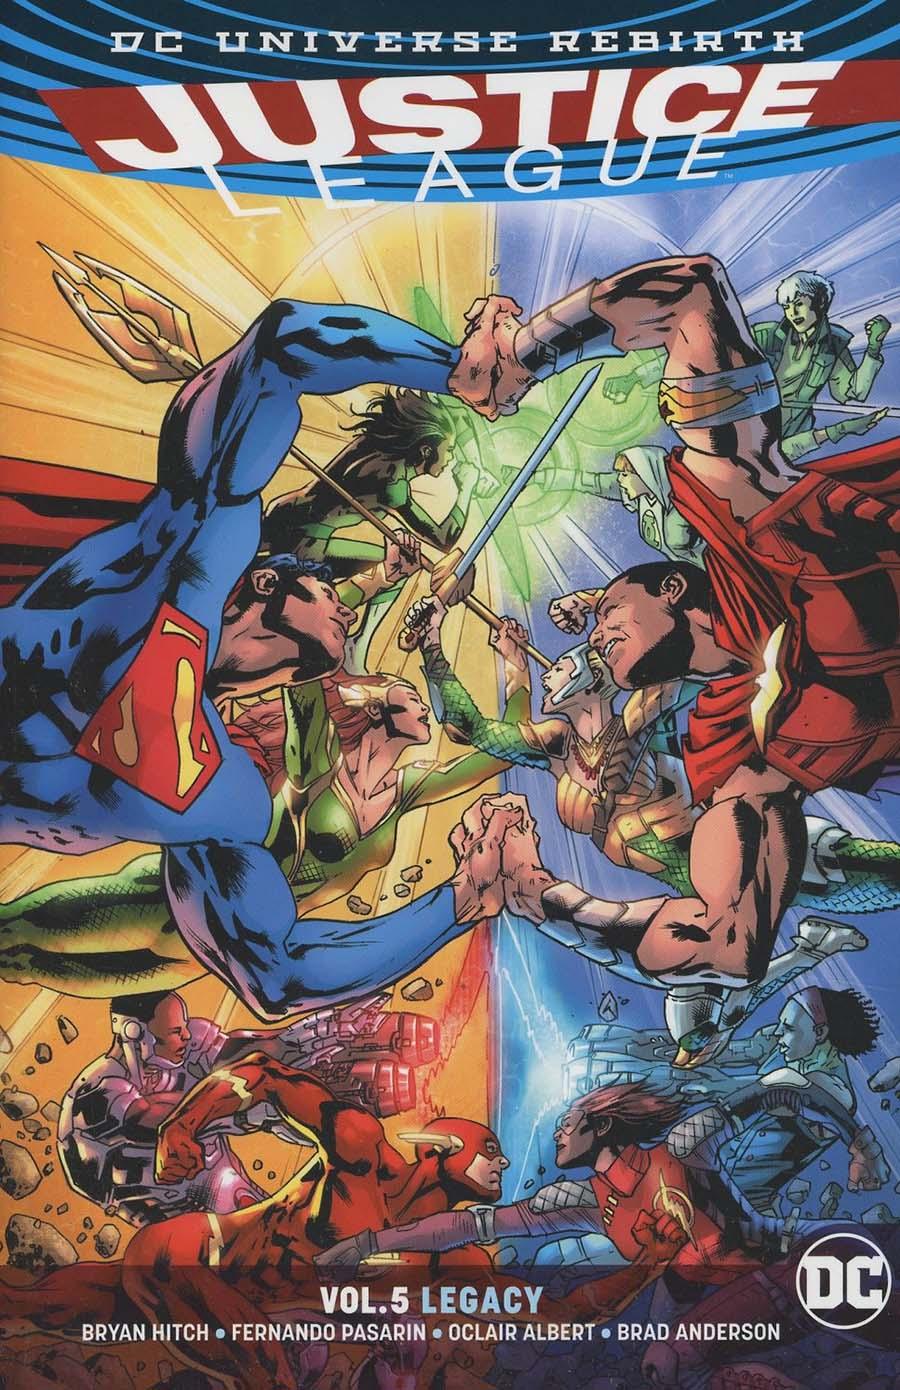 Justice League (Rebirth) Vol 5 Legacy TP